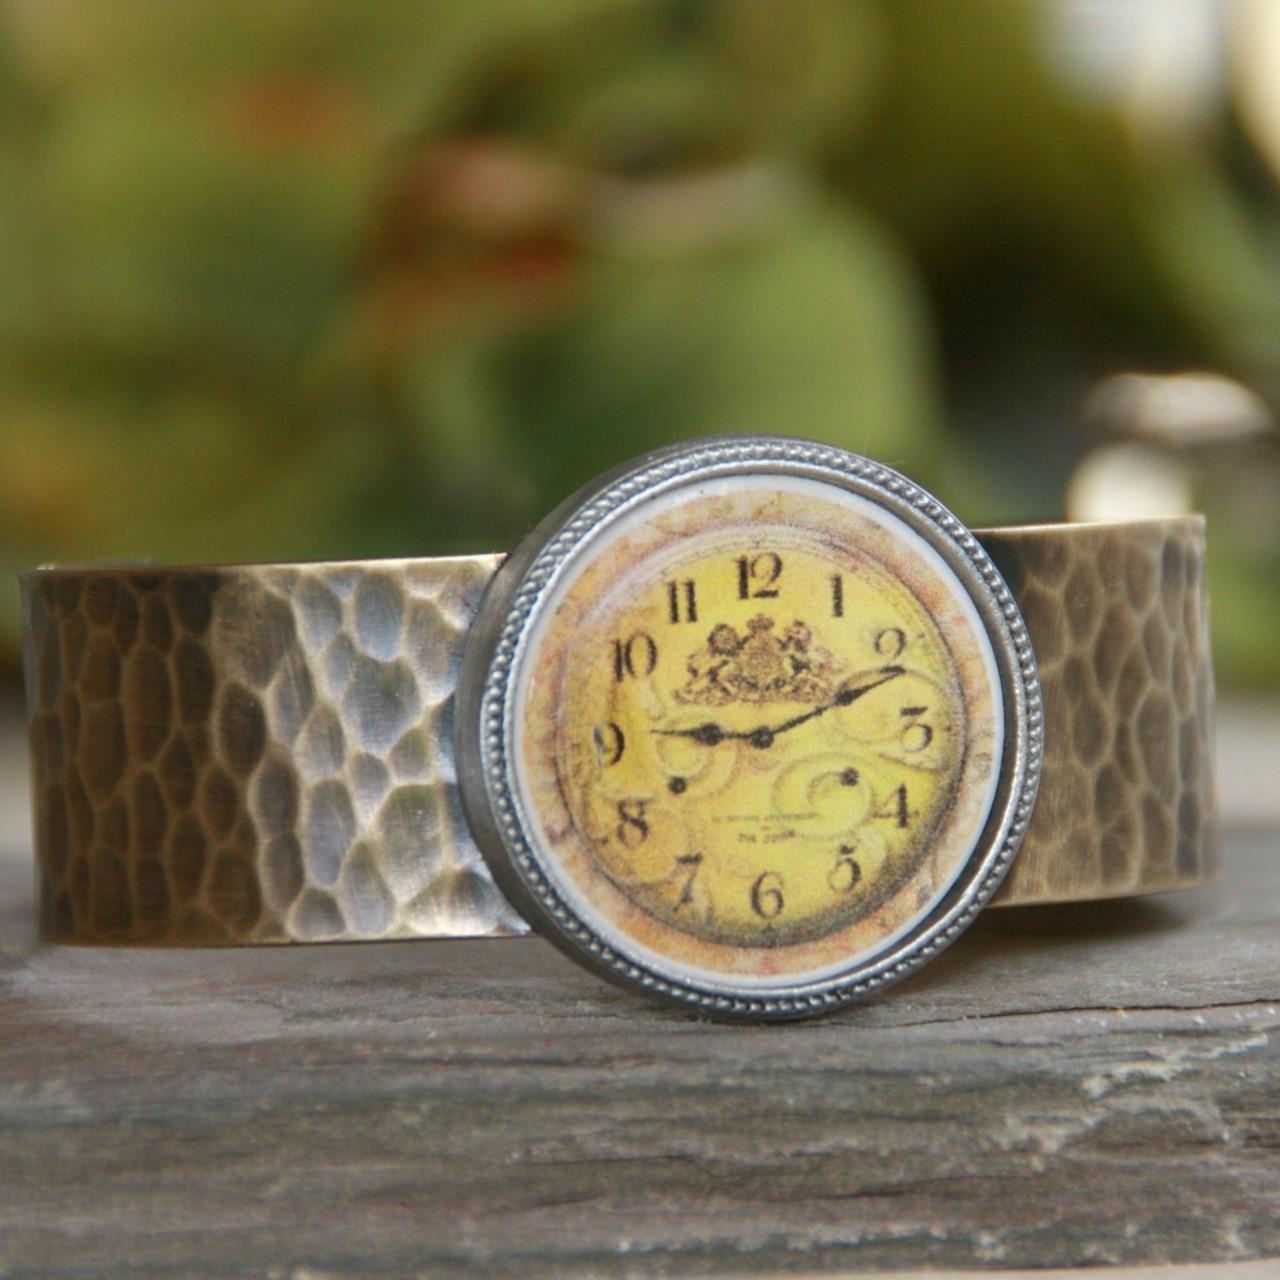 ART-120 Faux Watch Face Vintage Style Cuff Bracelet